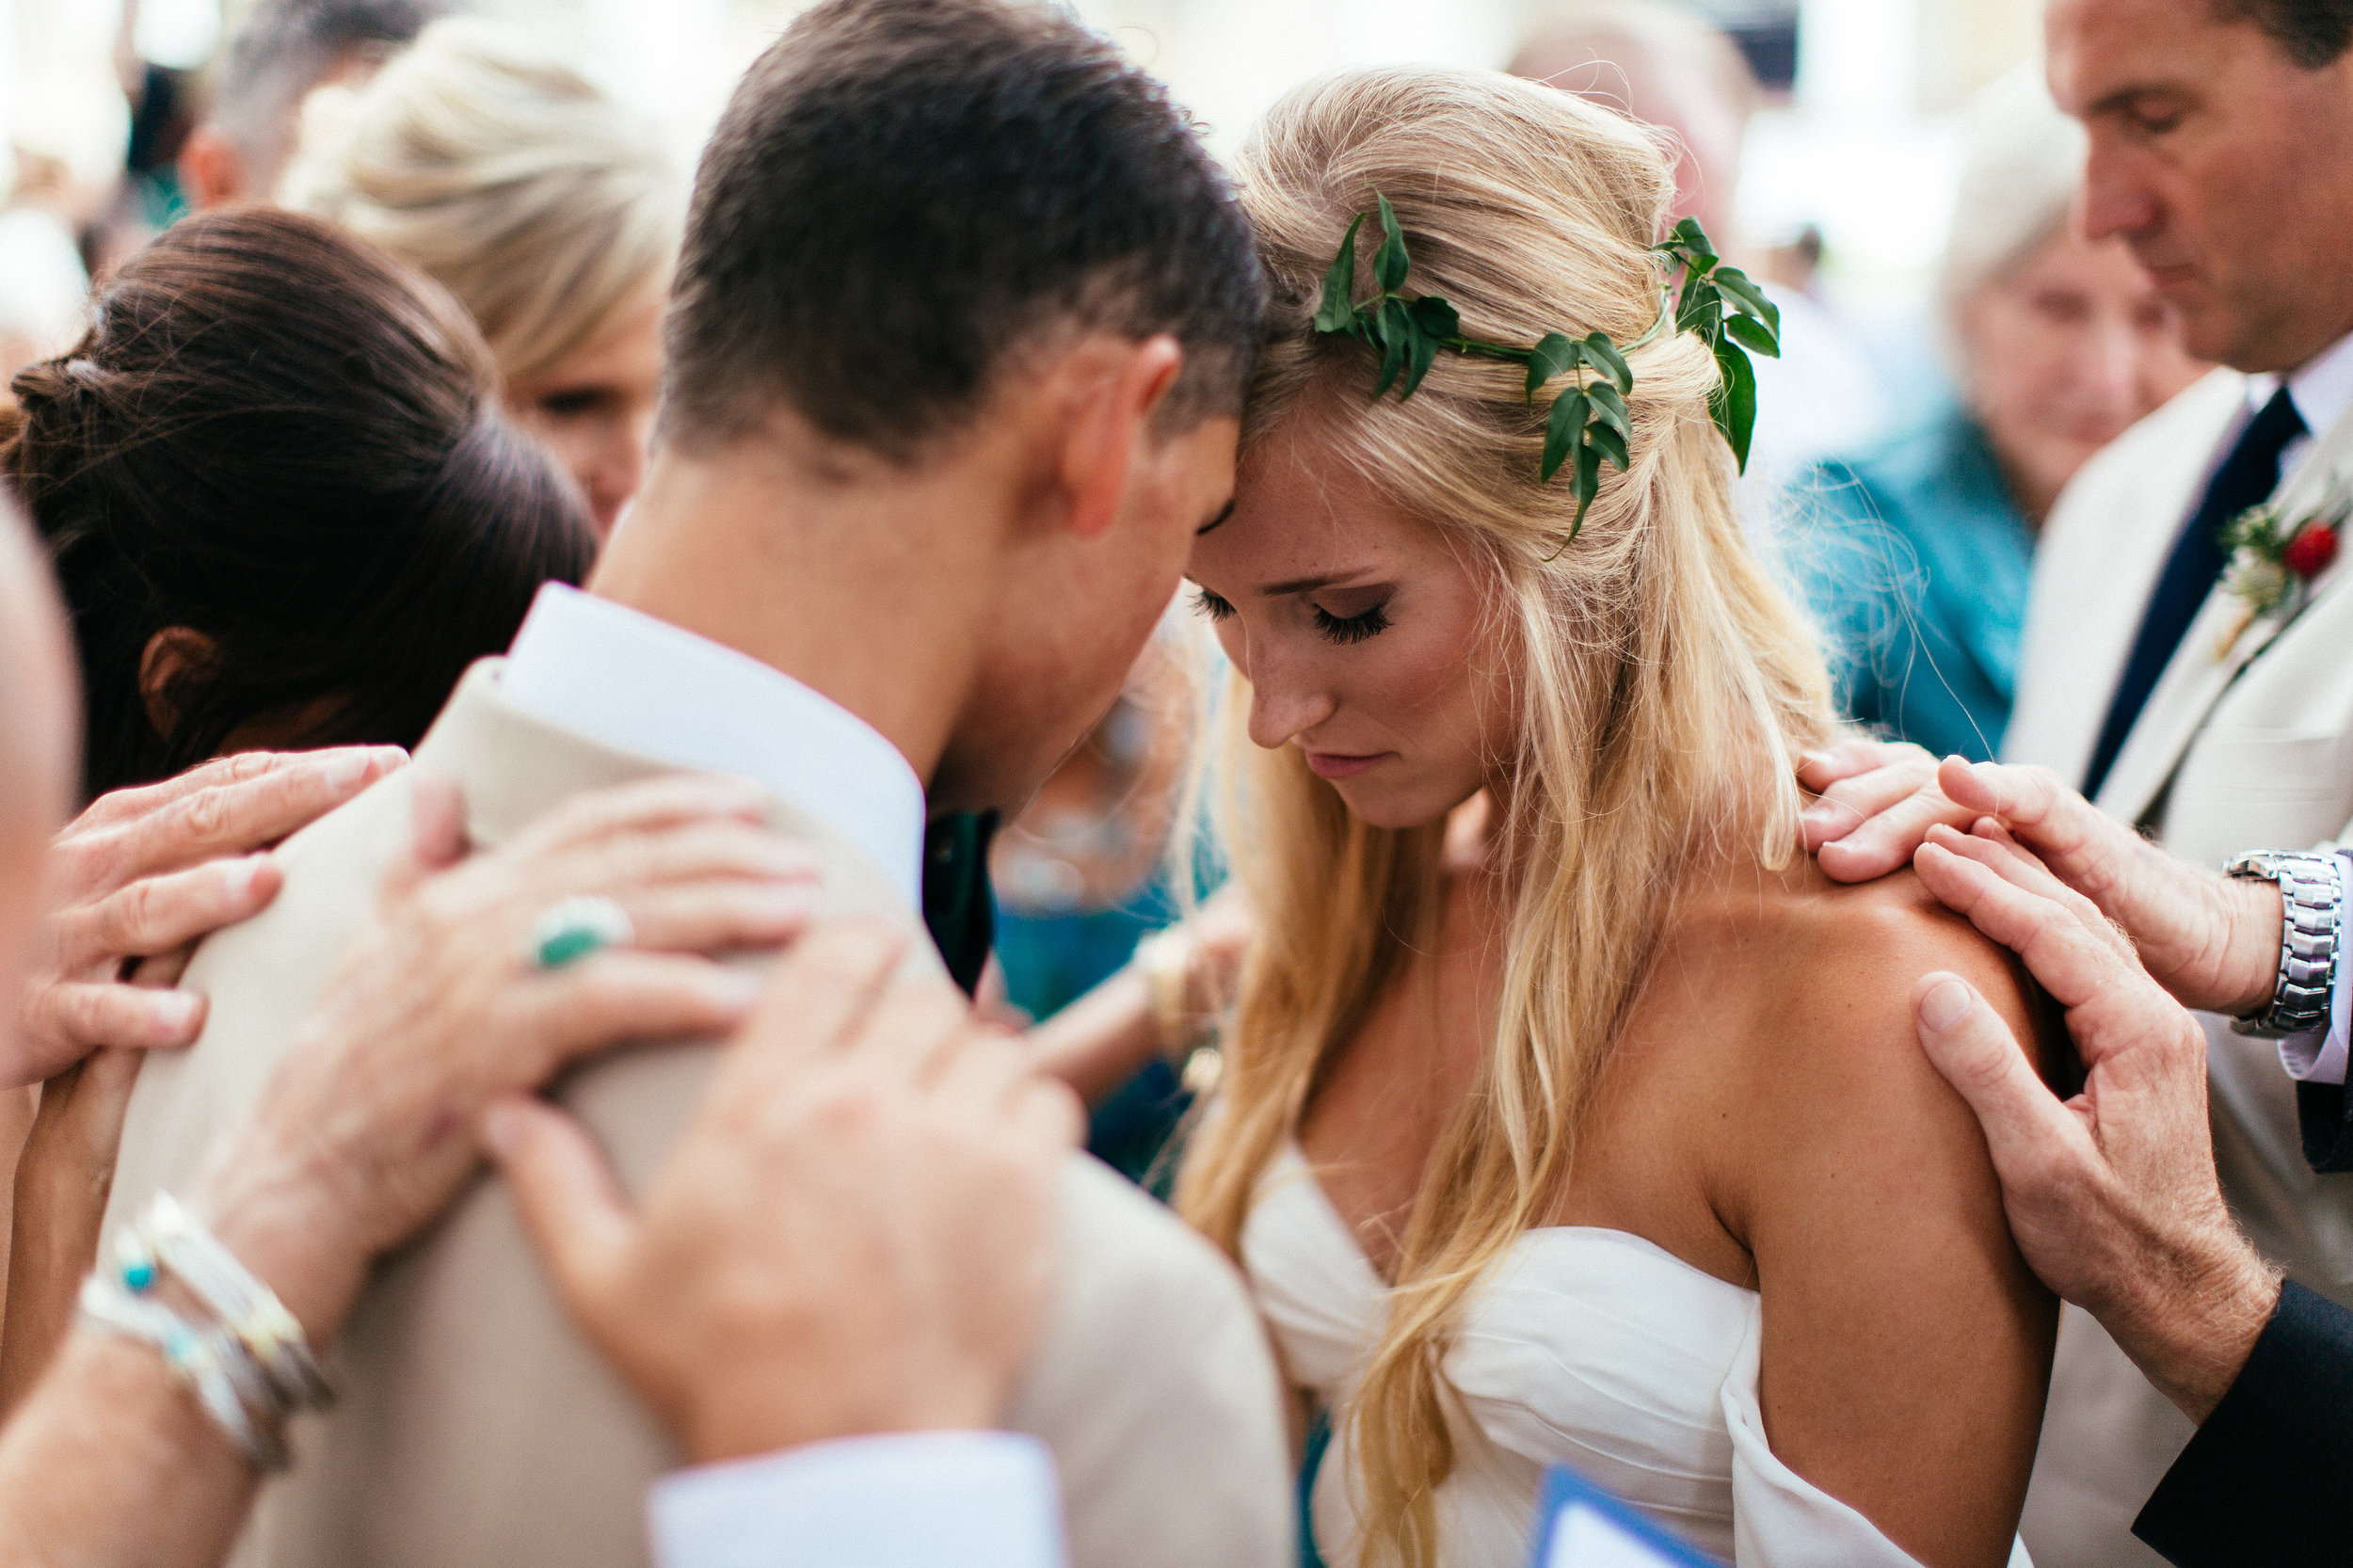 christina-karst-photography-ivory-and-beau-bridal-boutique-sarah-seven-lafayette-boho-bride-boho-bridal-boutique-indie-bridal-boutique-savannah-bridal-boutique-savannah-wedding-dresses-savannah-bridal-gowns-14.jpg